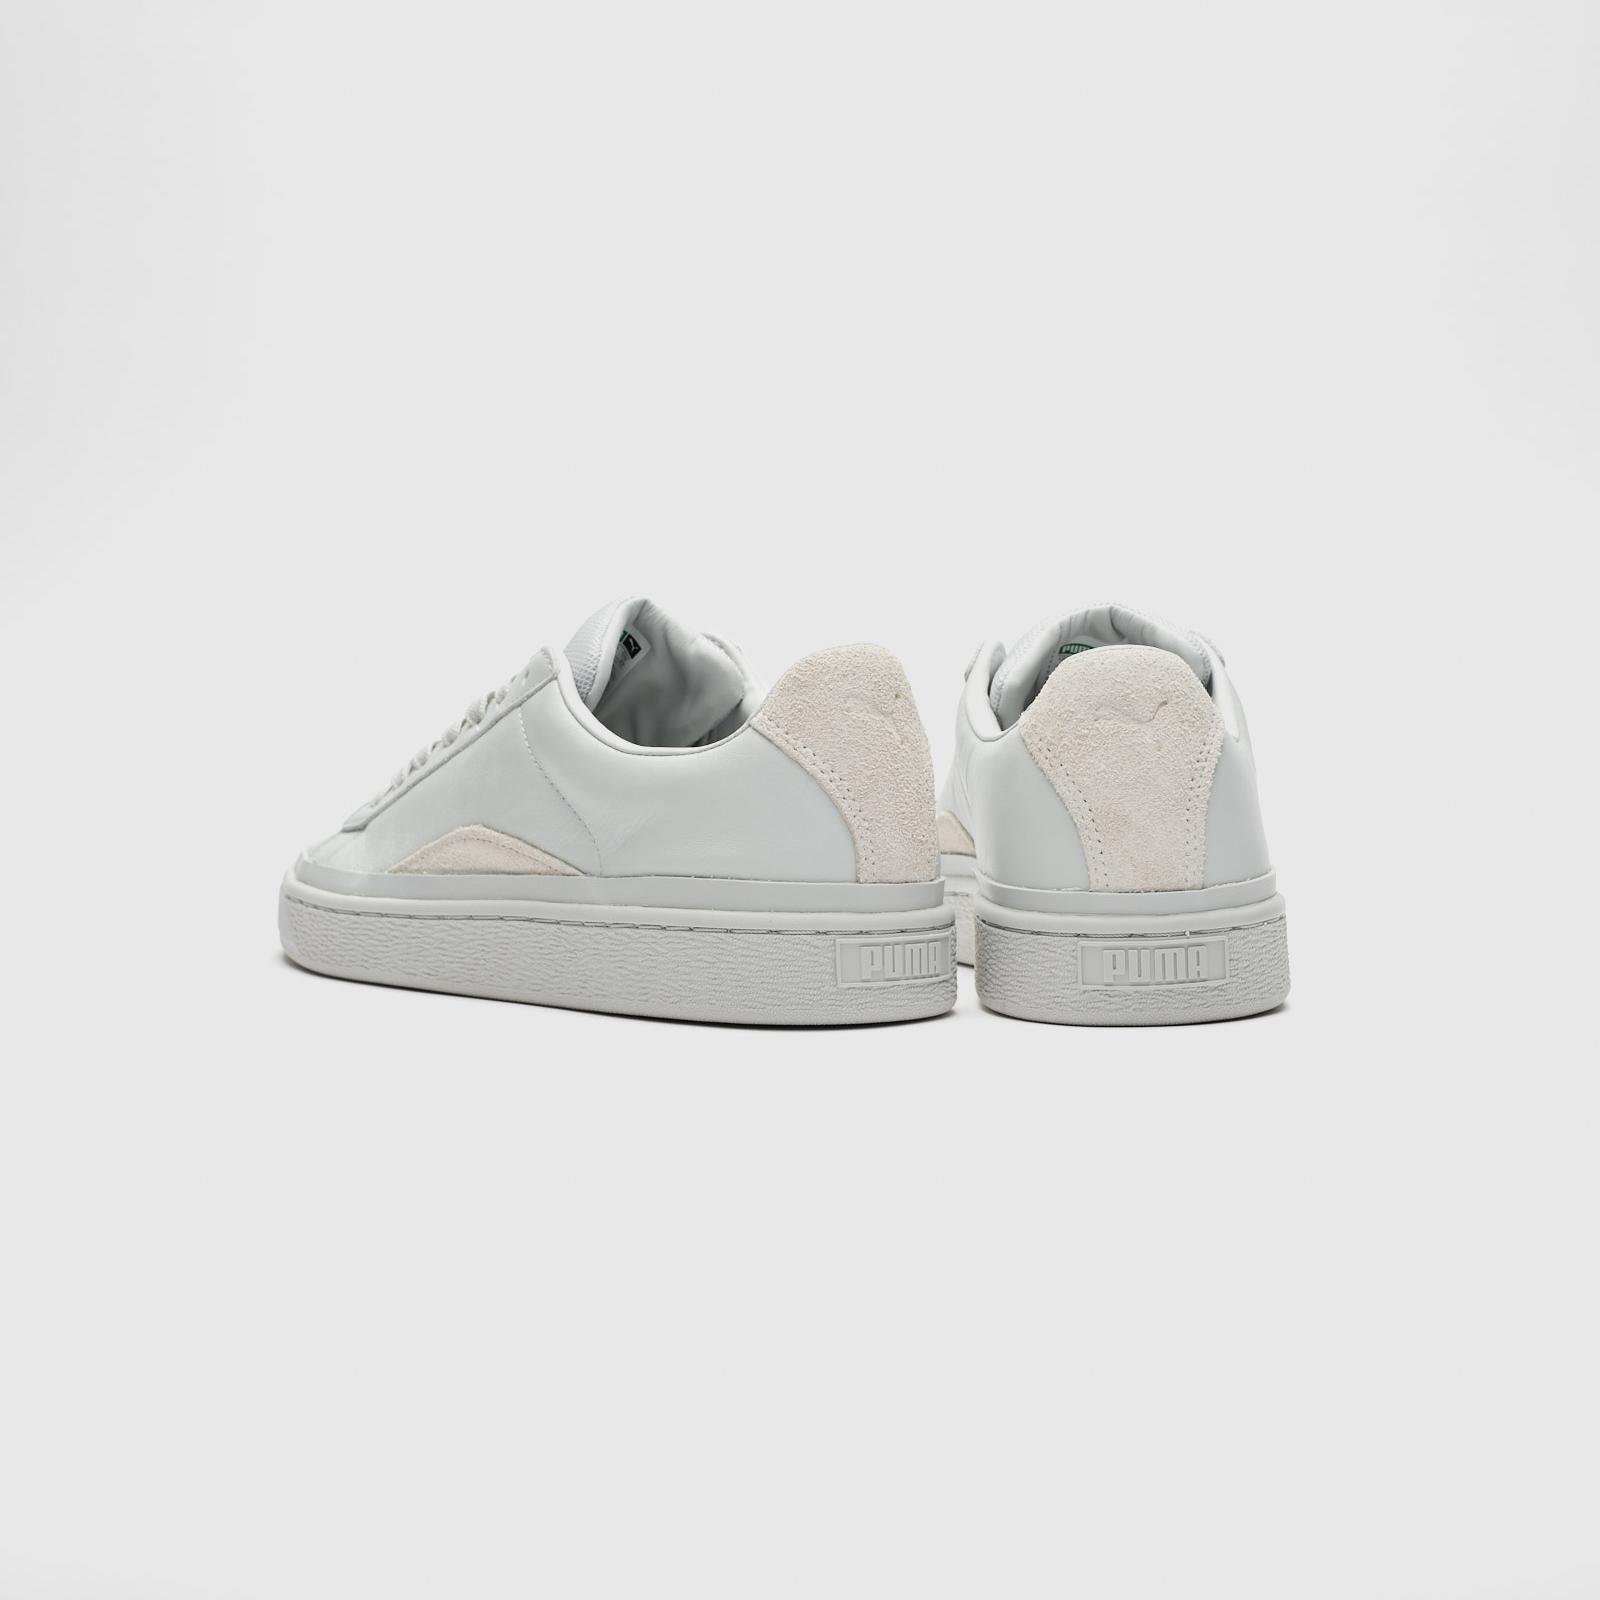 best service ce9ae 4ba12 Puma Basket HAN - 367185-02 - Sneakersnstuff | sneakers ...